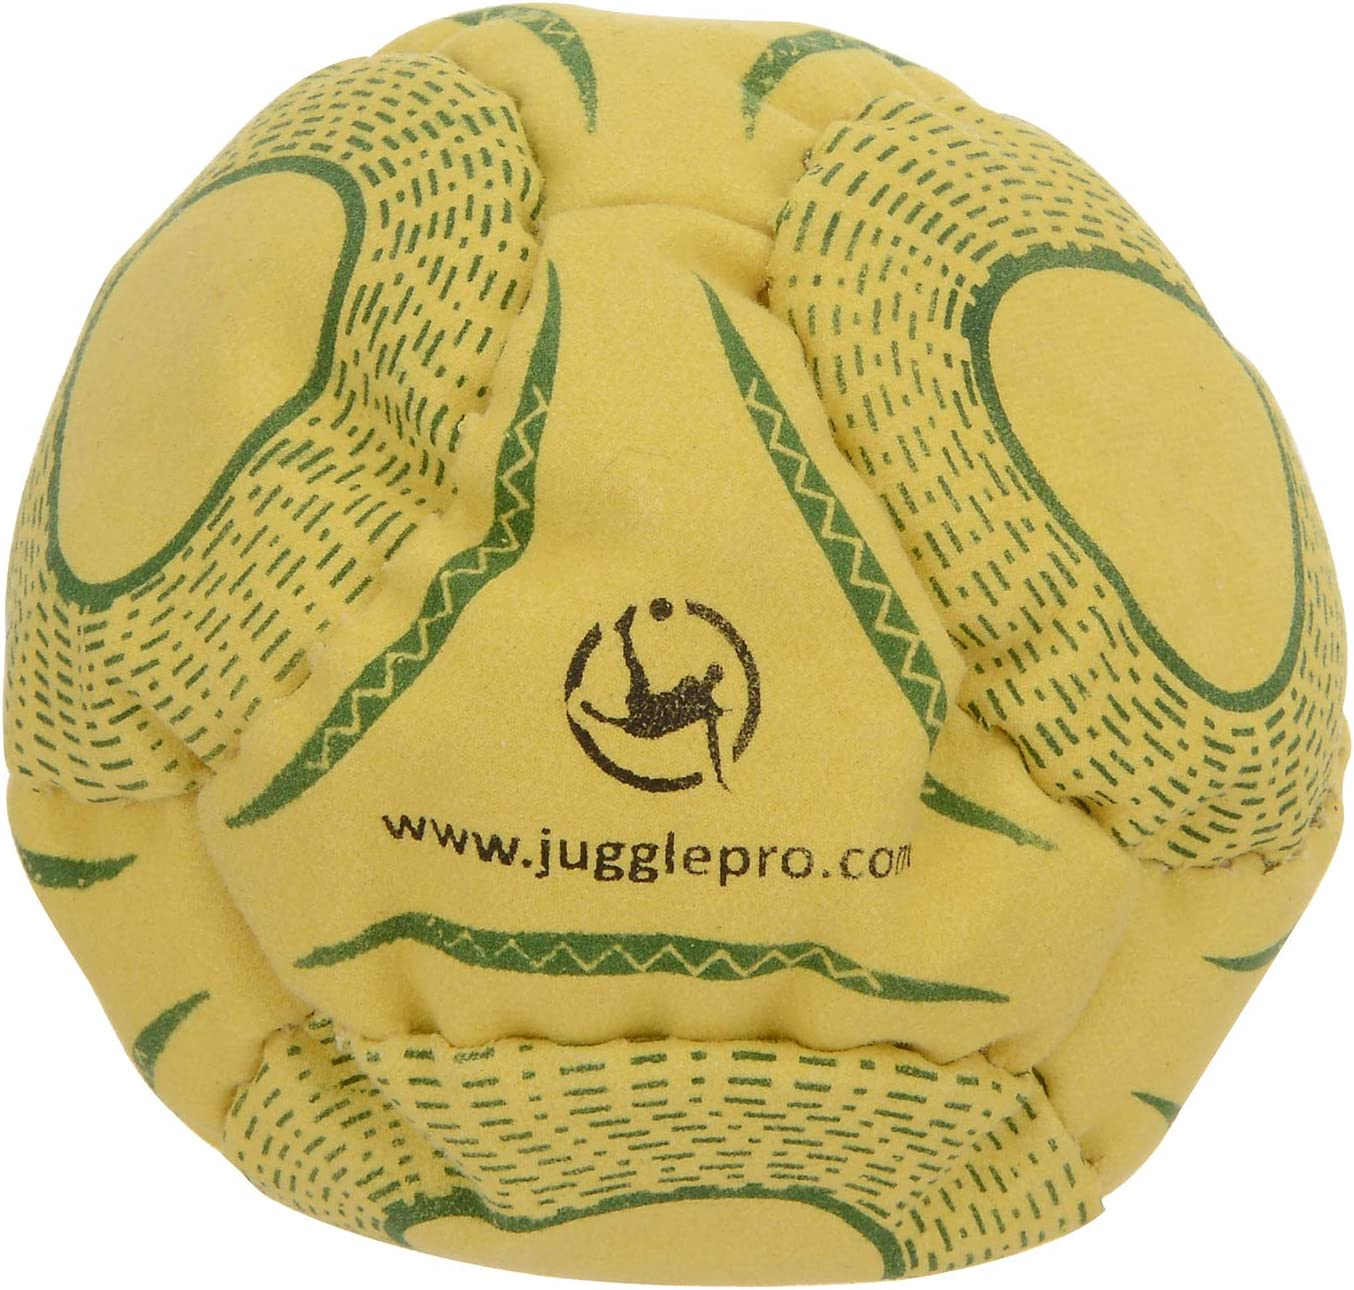 Jugglepro Fu/ßsack Worldcup 8 Hosen Ultraschall Brasilien Farben